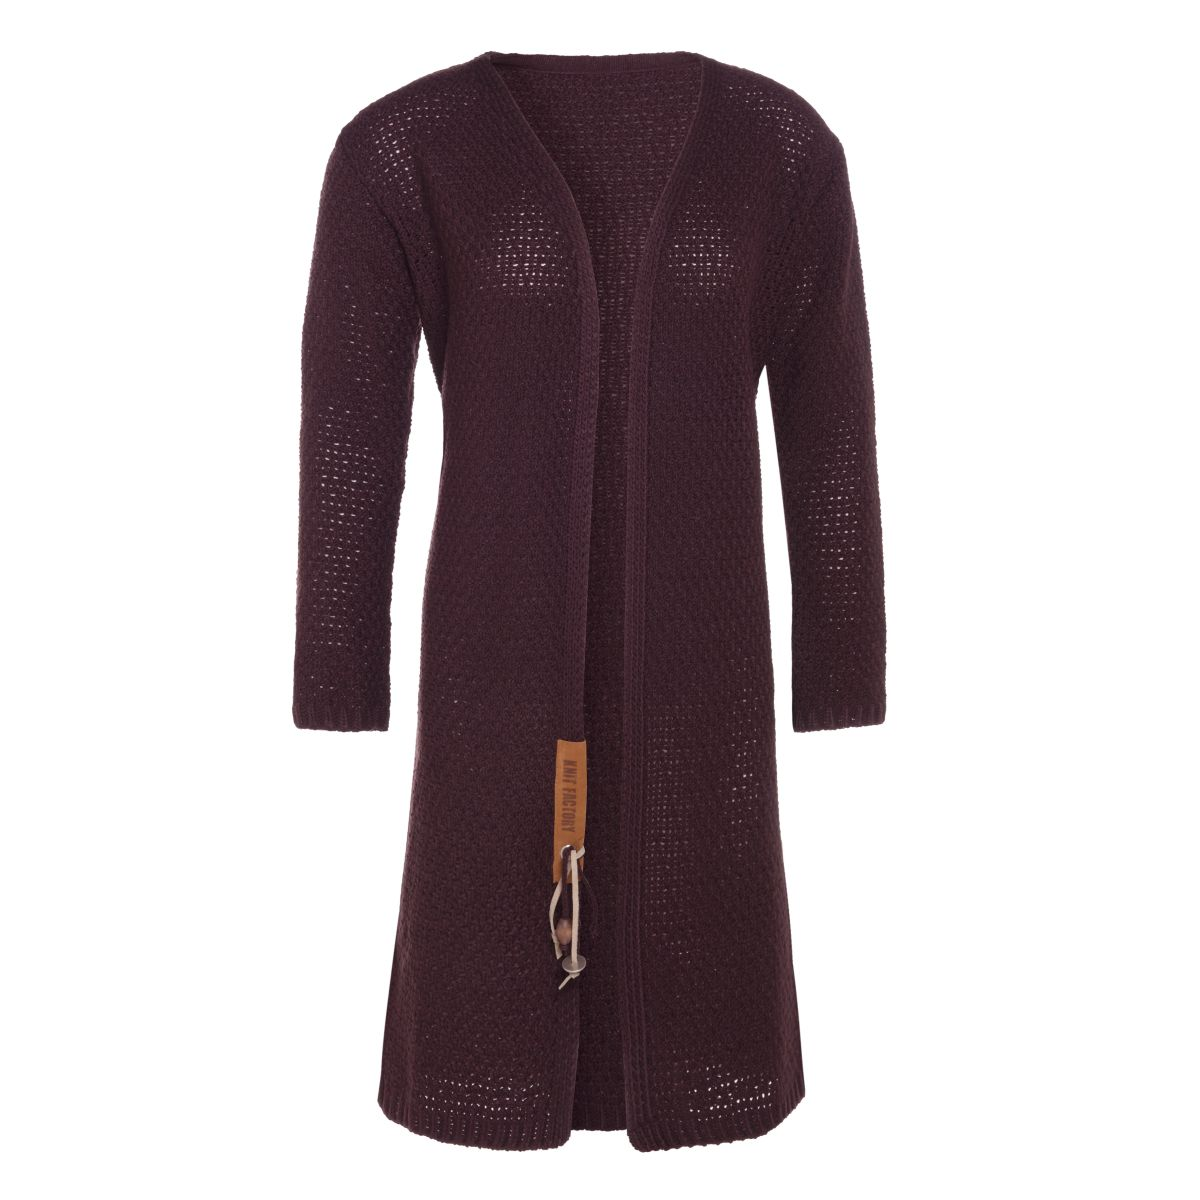 luna long knitted cardigan aubergine 4042